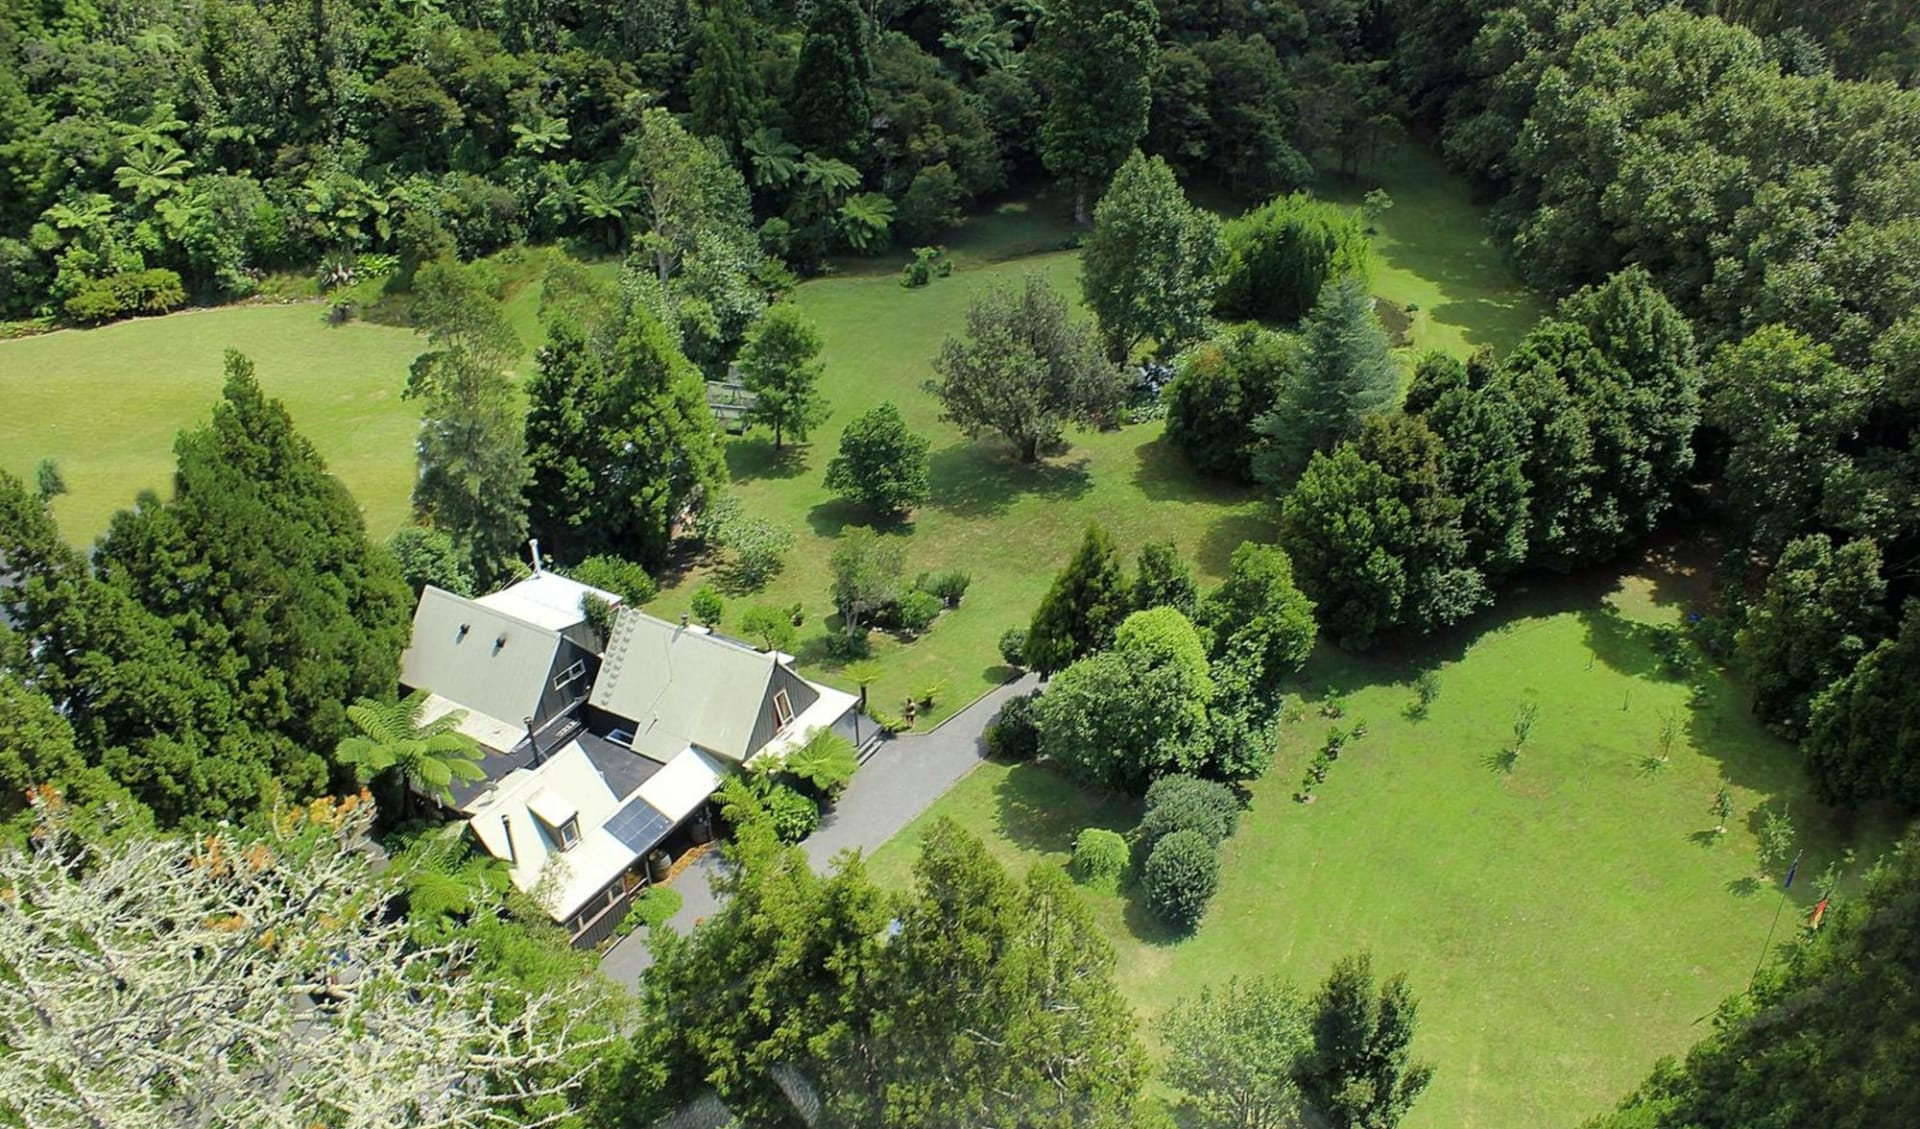 Bushland Park Lodge in Whangamata:  2 Bushland Park Lodge & Retreat air 2014 ss